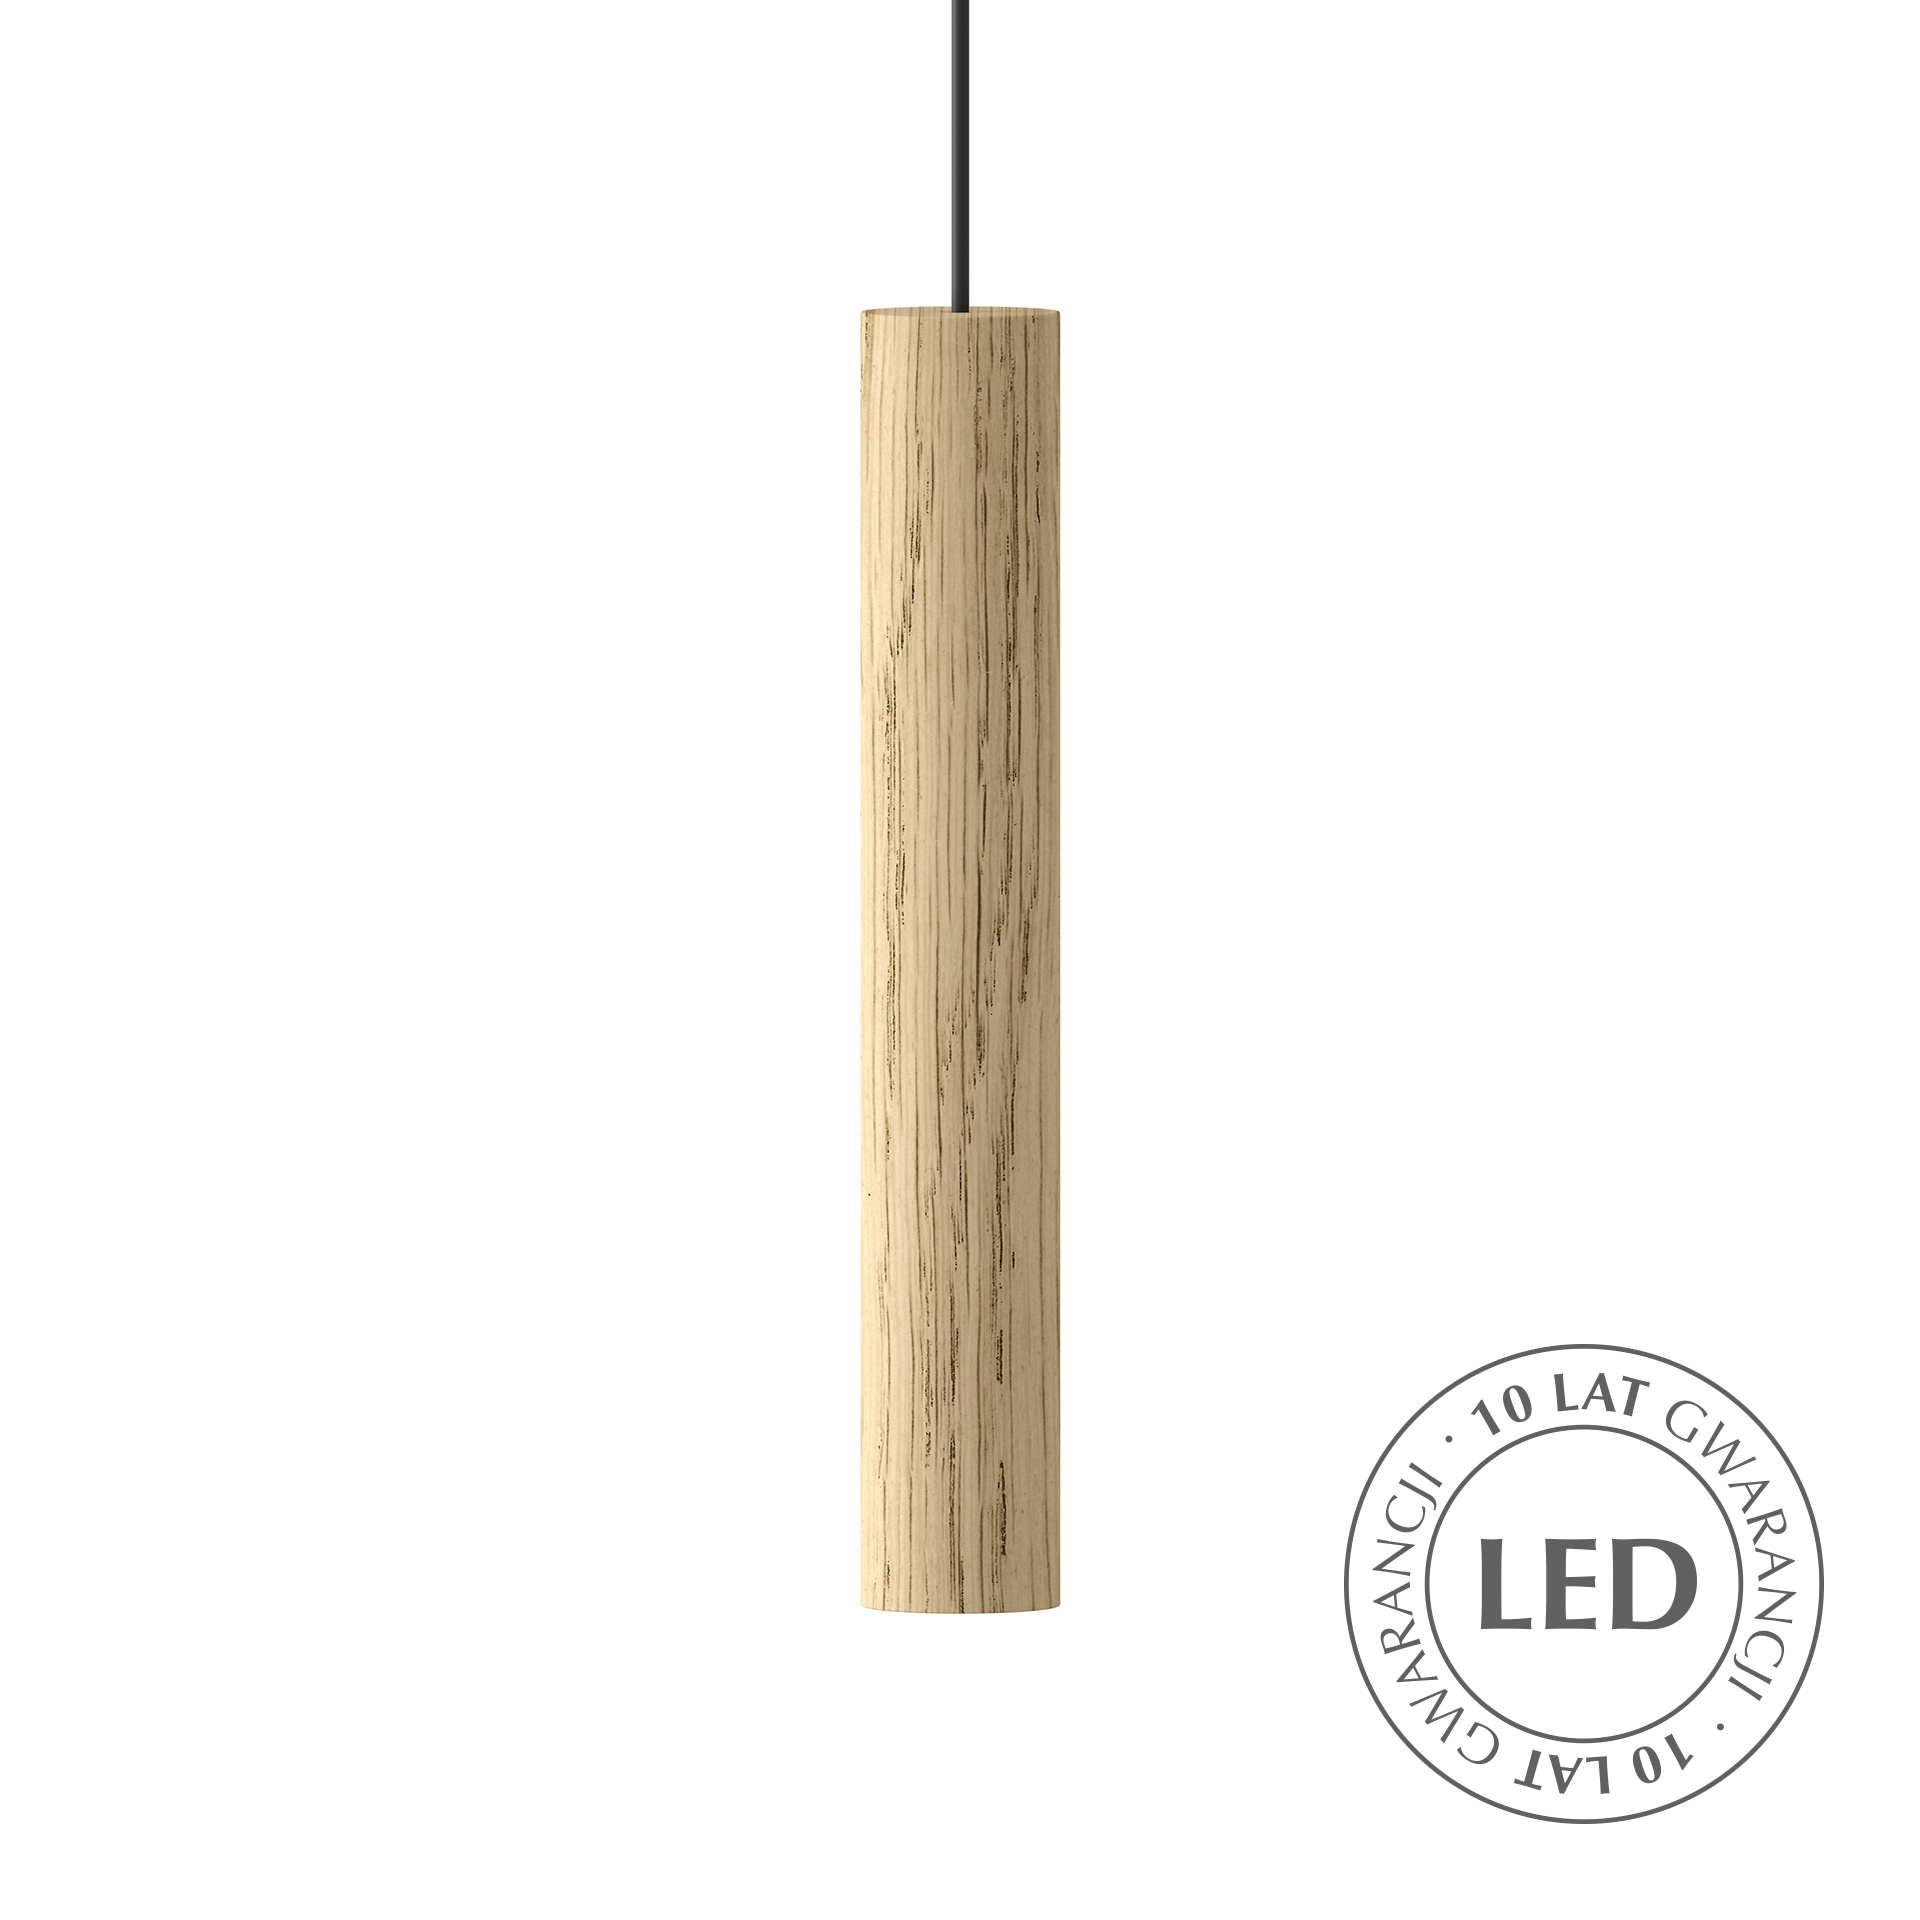 Lampa wisząca Chimes Oak 2165 UMAGE designerska drewniana